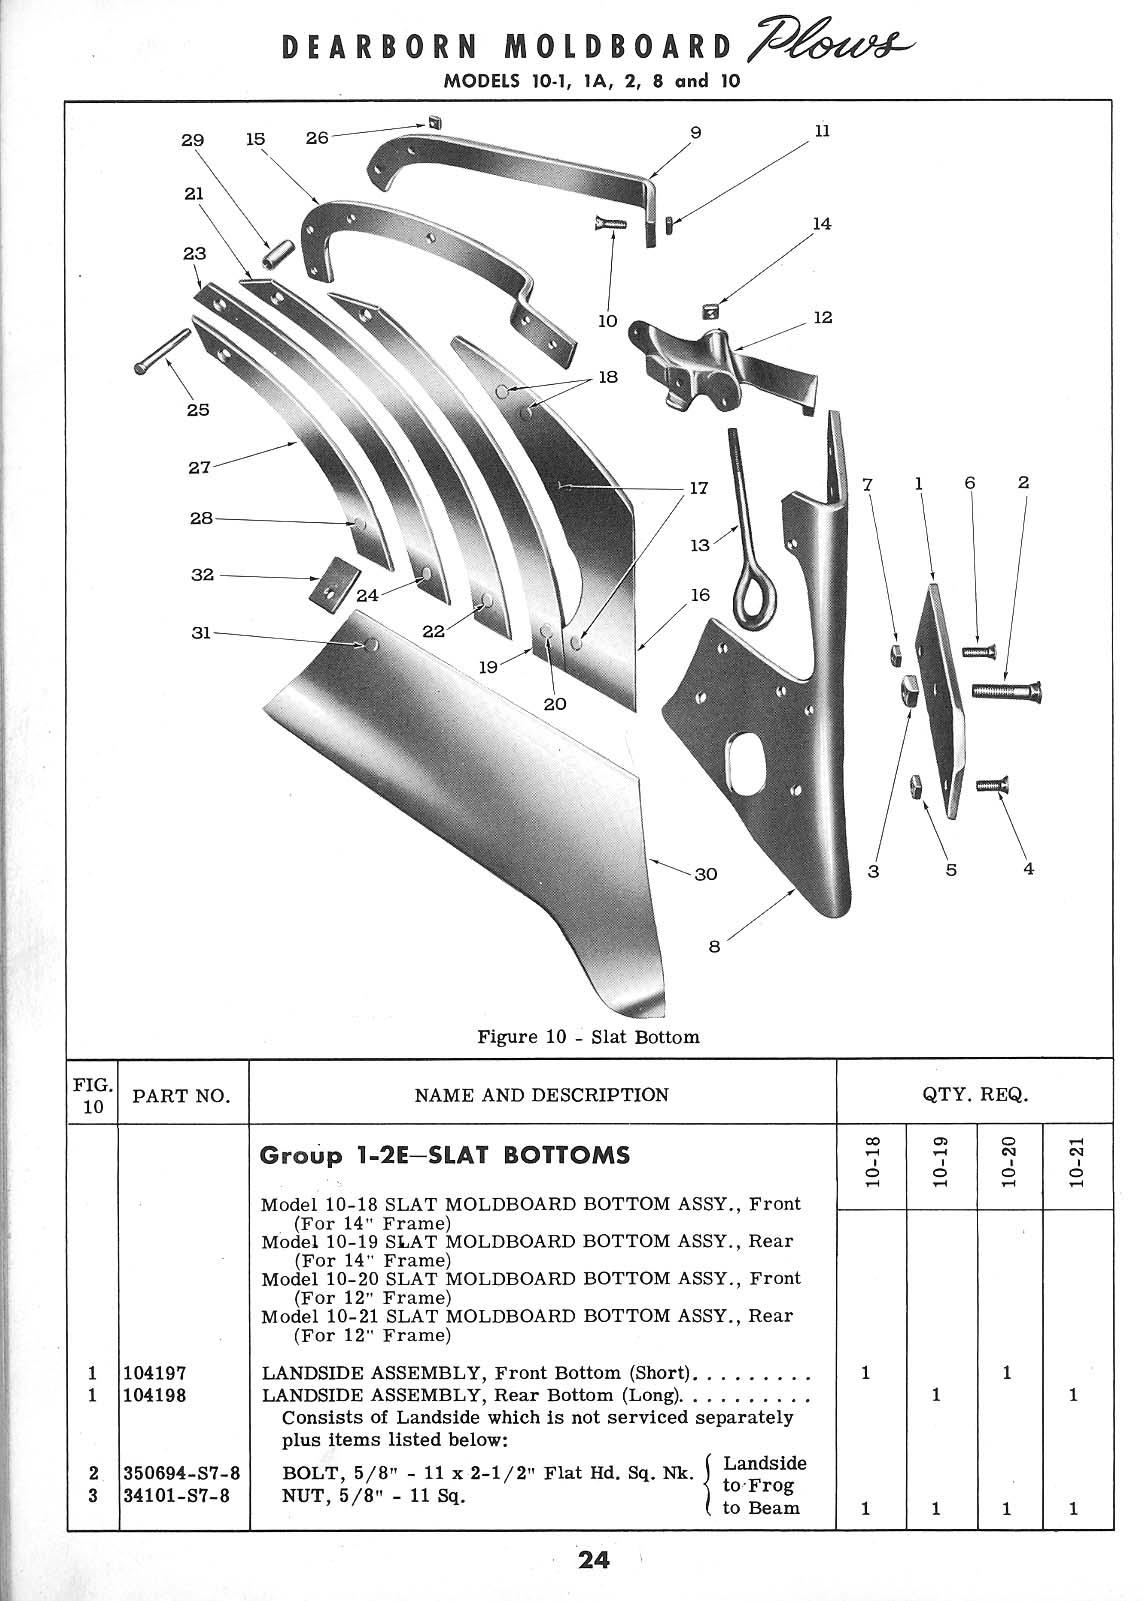 Subject moldboard plow bottoms dealer parts info